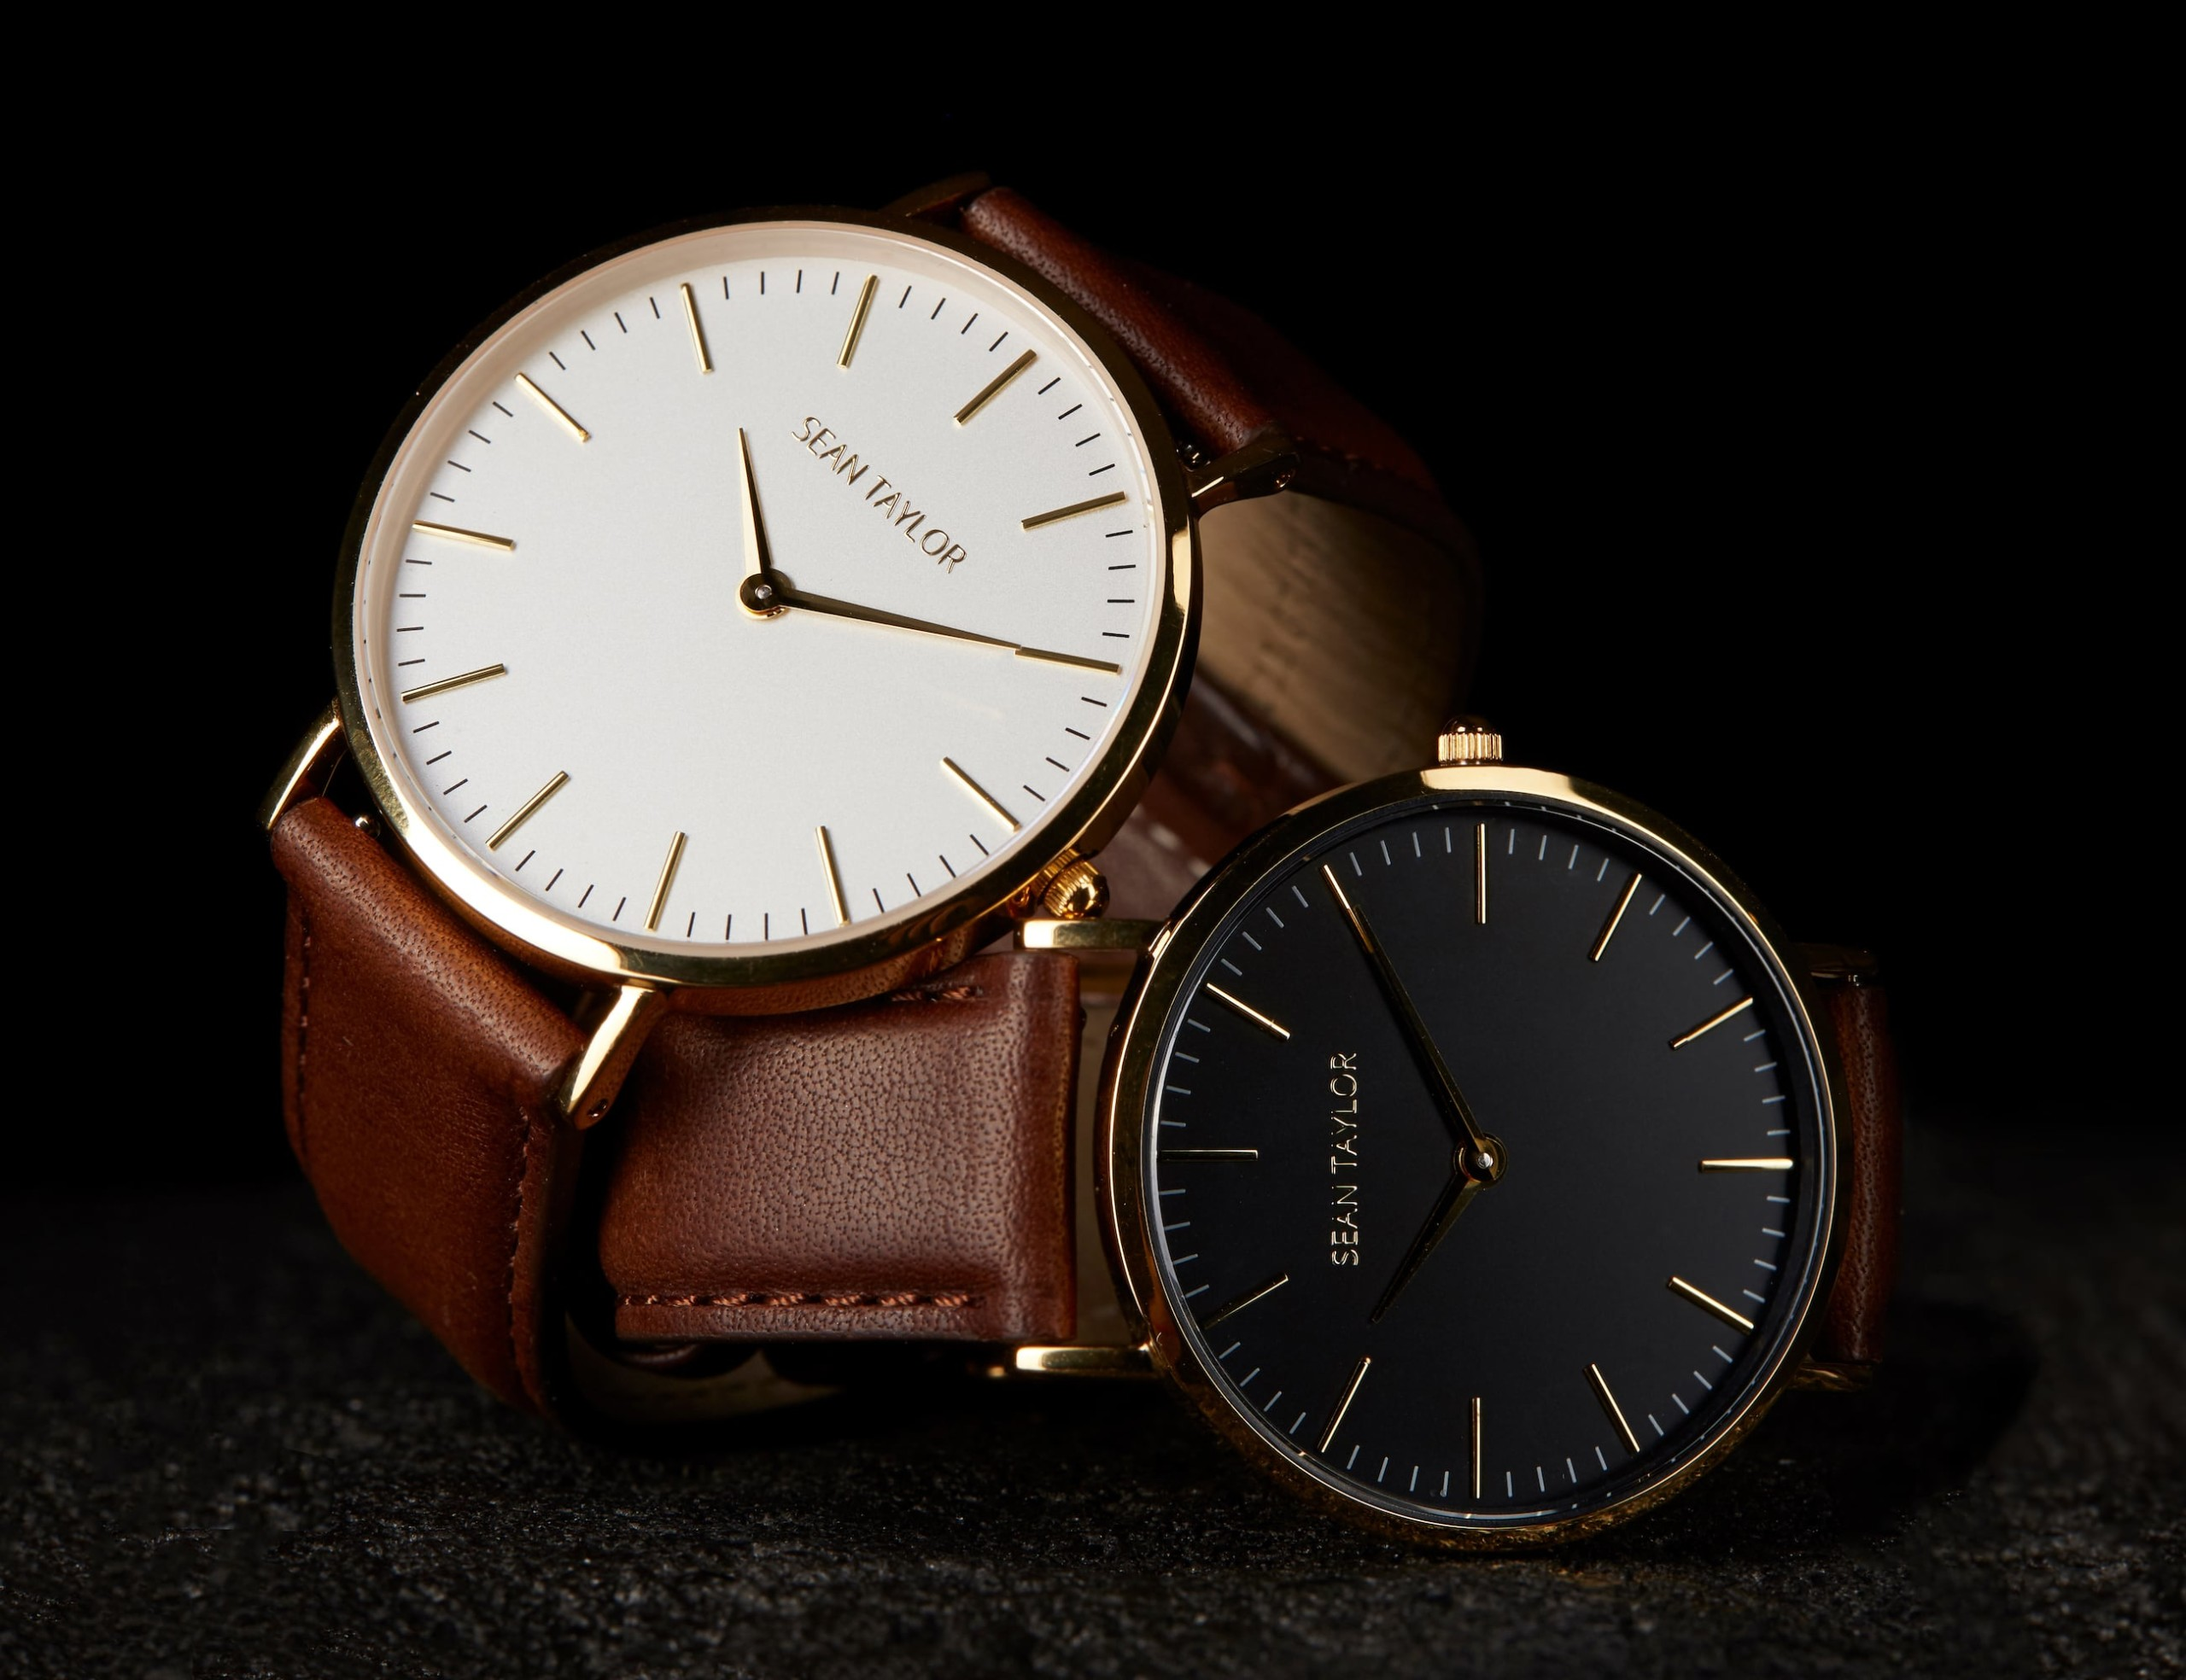 Sean Taylor Italian Leather Minimalist Watch is elegant and durable